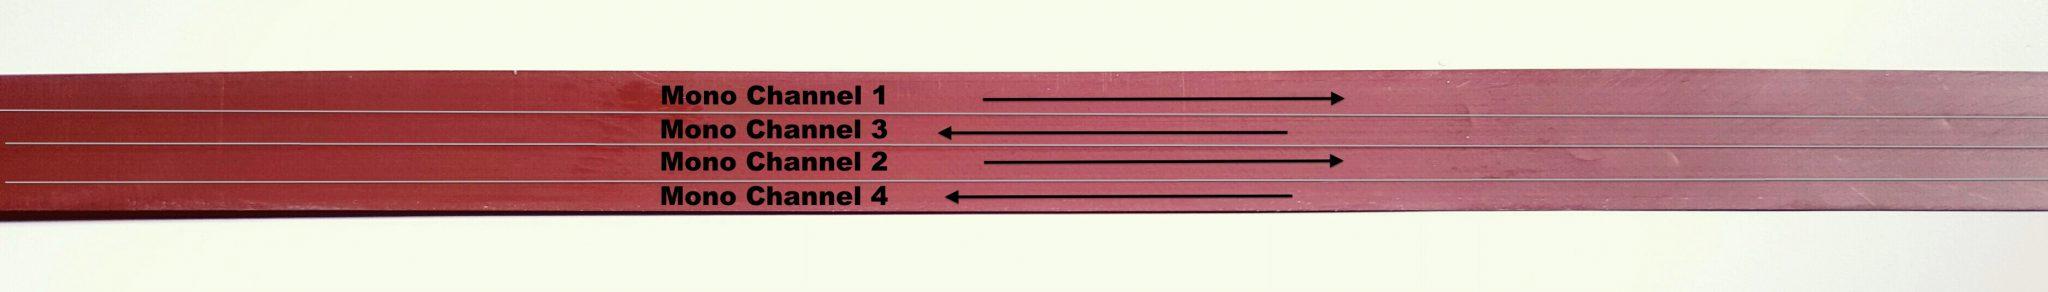 Audio Transfers Reel to Reel 4 Track Mono